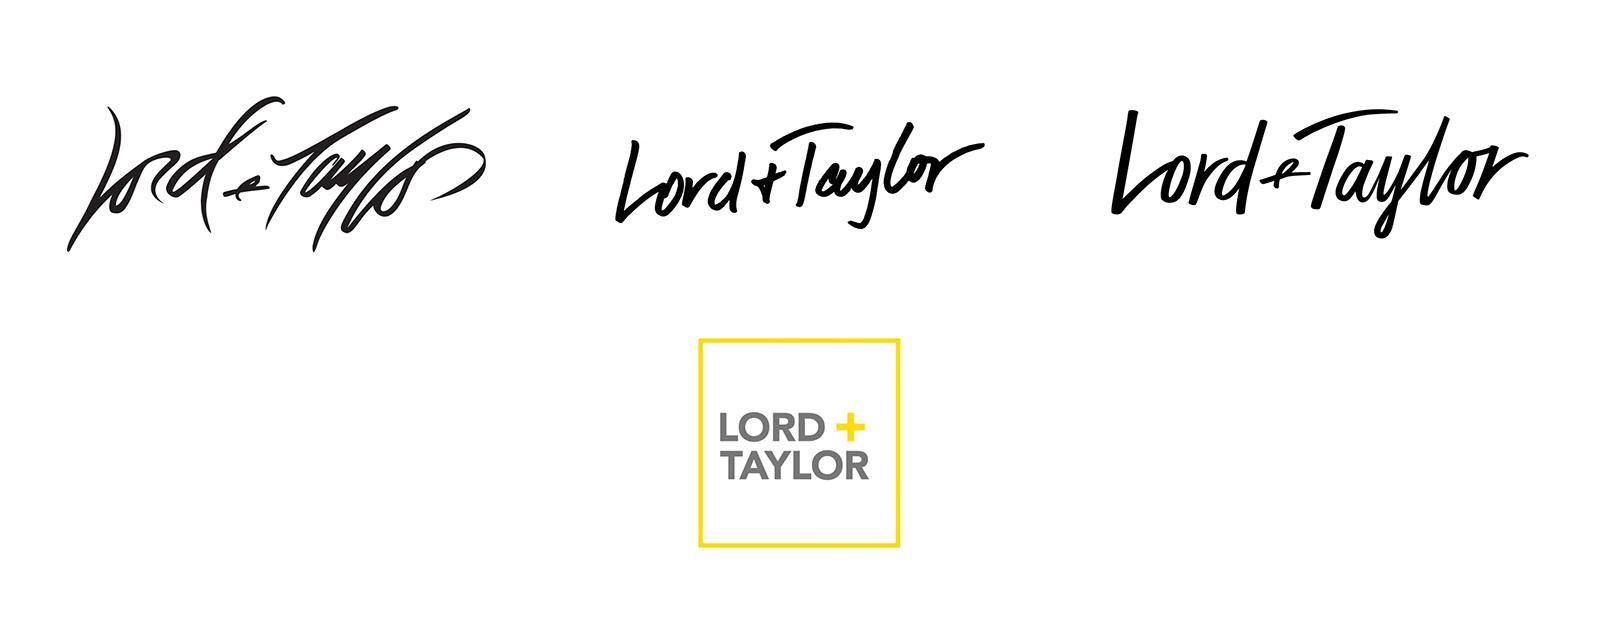 Lord + Taylor连锁商店品牌启用全新的品牌logo设计-深圳vi设计3